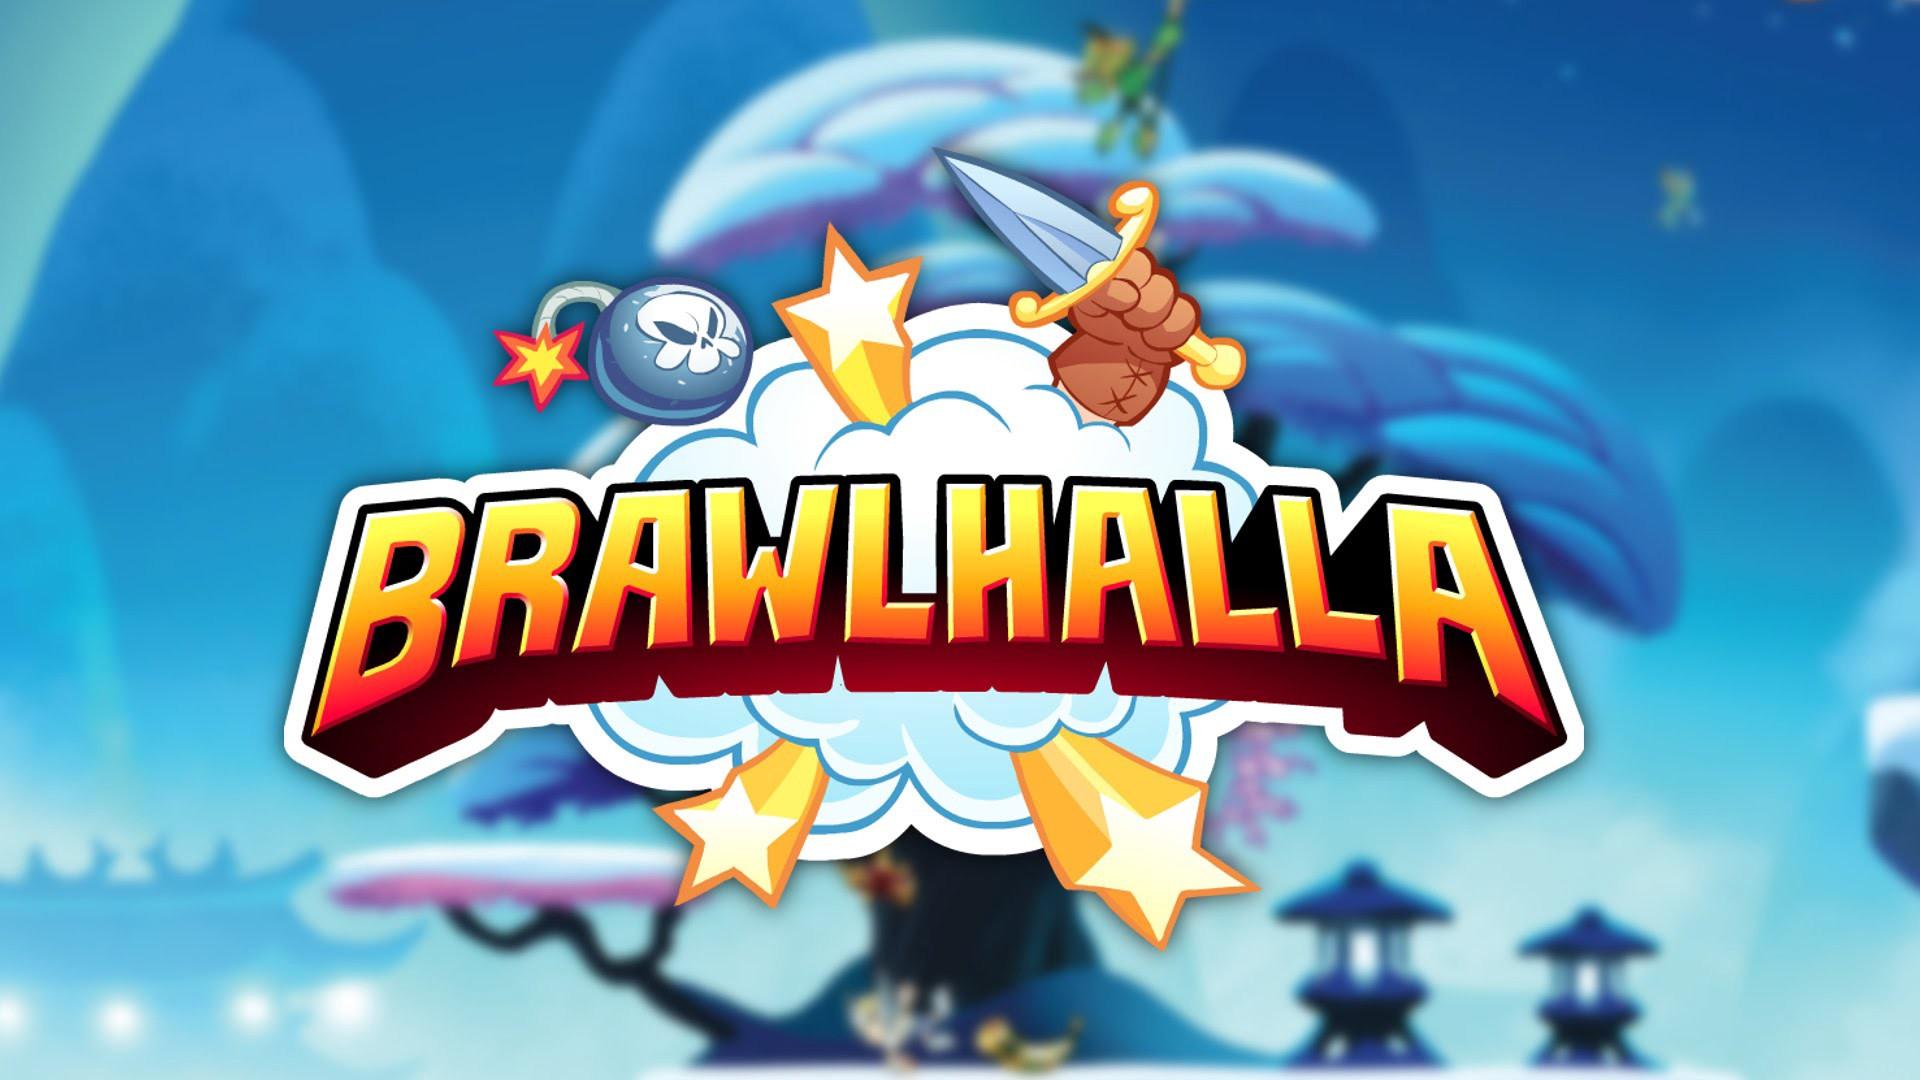 Fighting Wallpaper Hd Brawlhalla Wallpapers